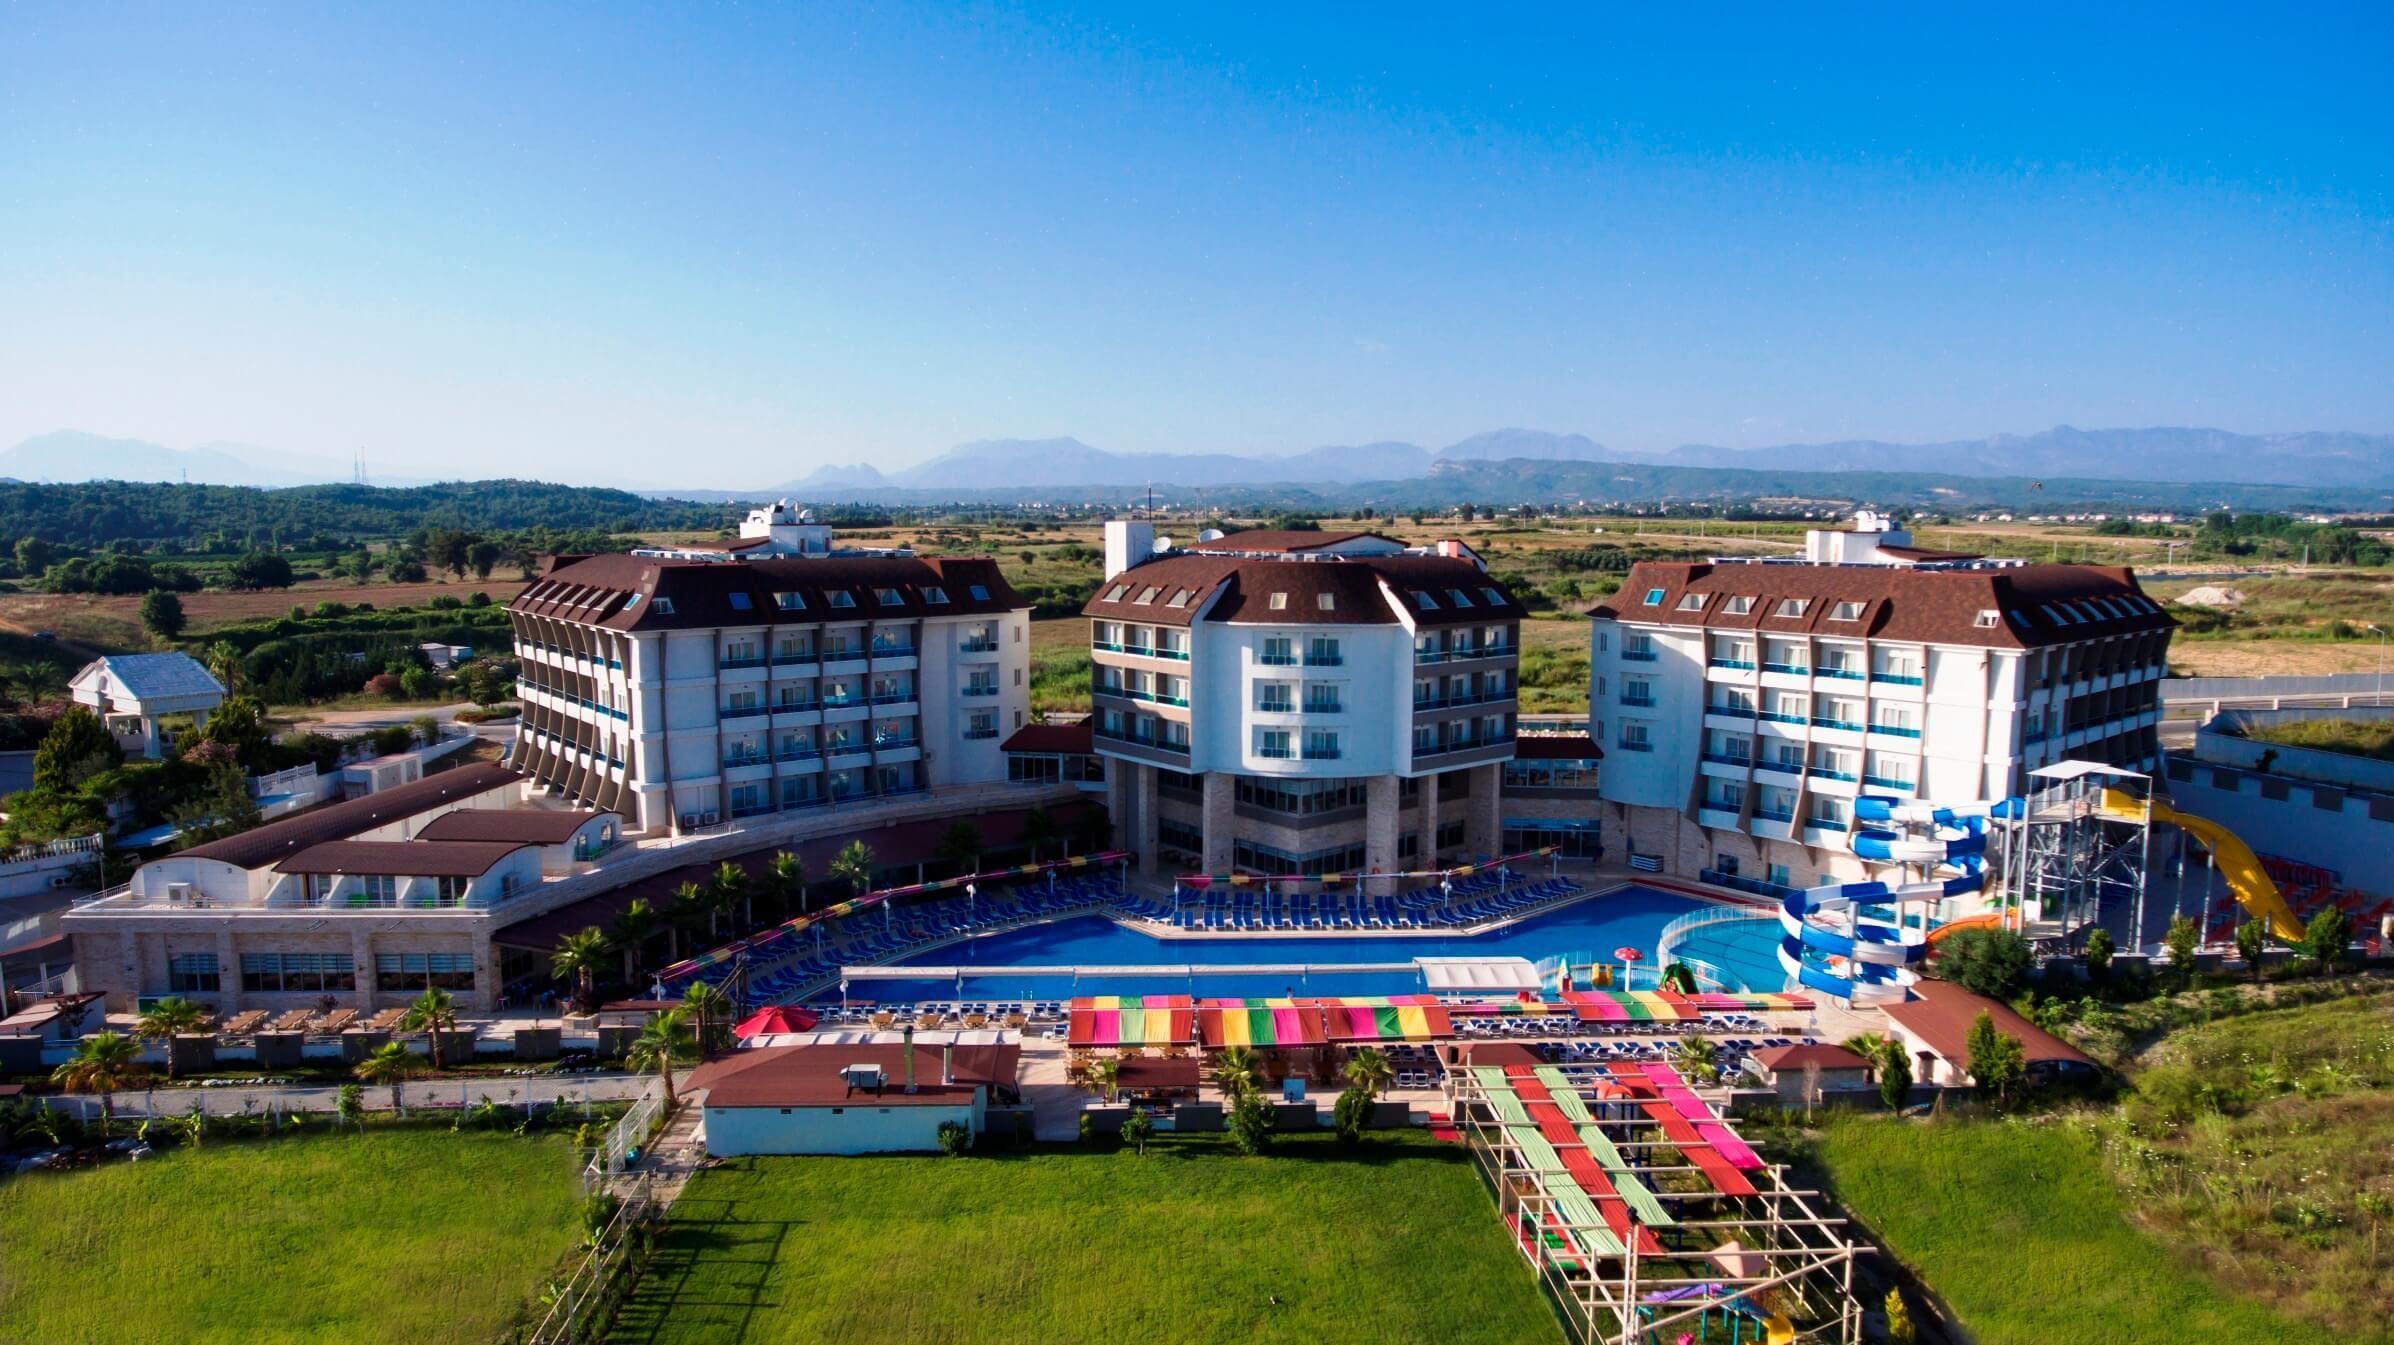 http://www.orextravel.sk/OREX/hotelphotos/ramada-resort-side-general-0016.jpg